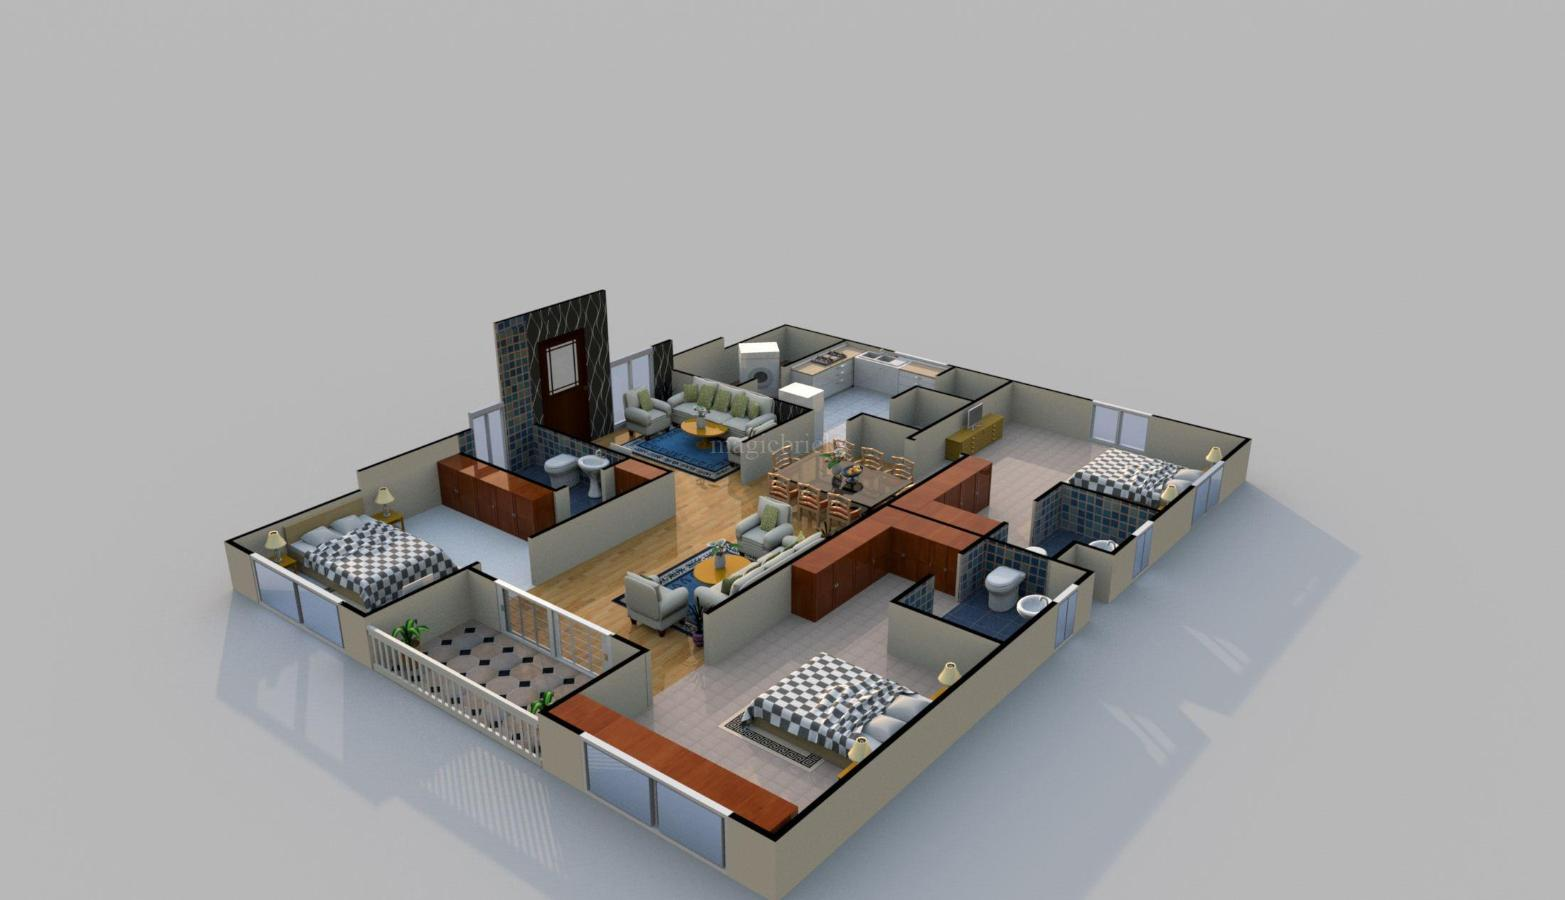 21157677_4_Floor Plan 24 My Home Abhra Hyderabad 5026856_1265_2200_600_900 my house plans floor plans fancy home design,Floor Plans For My Home